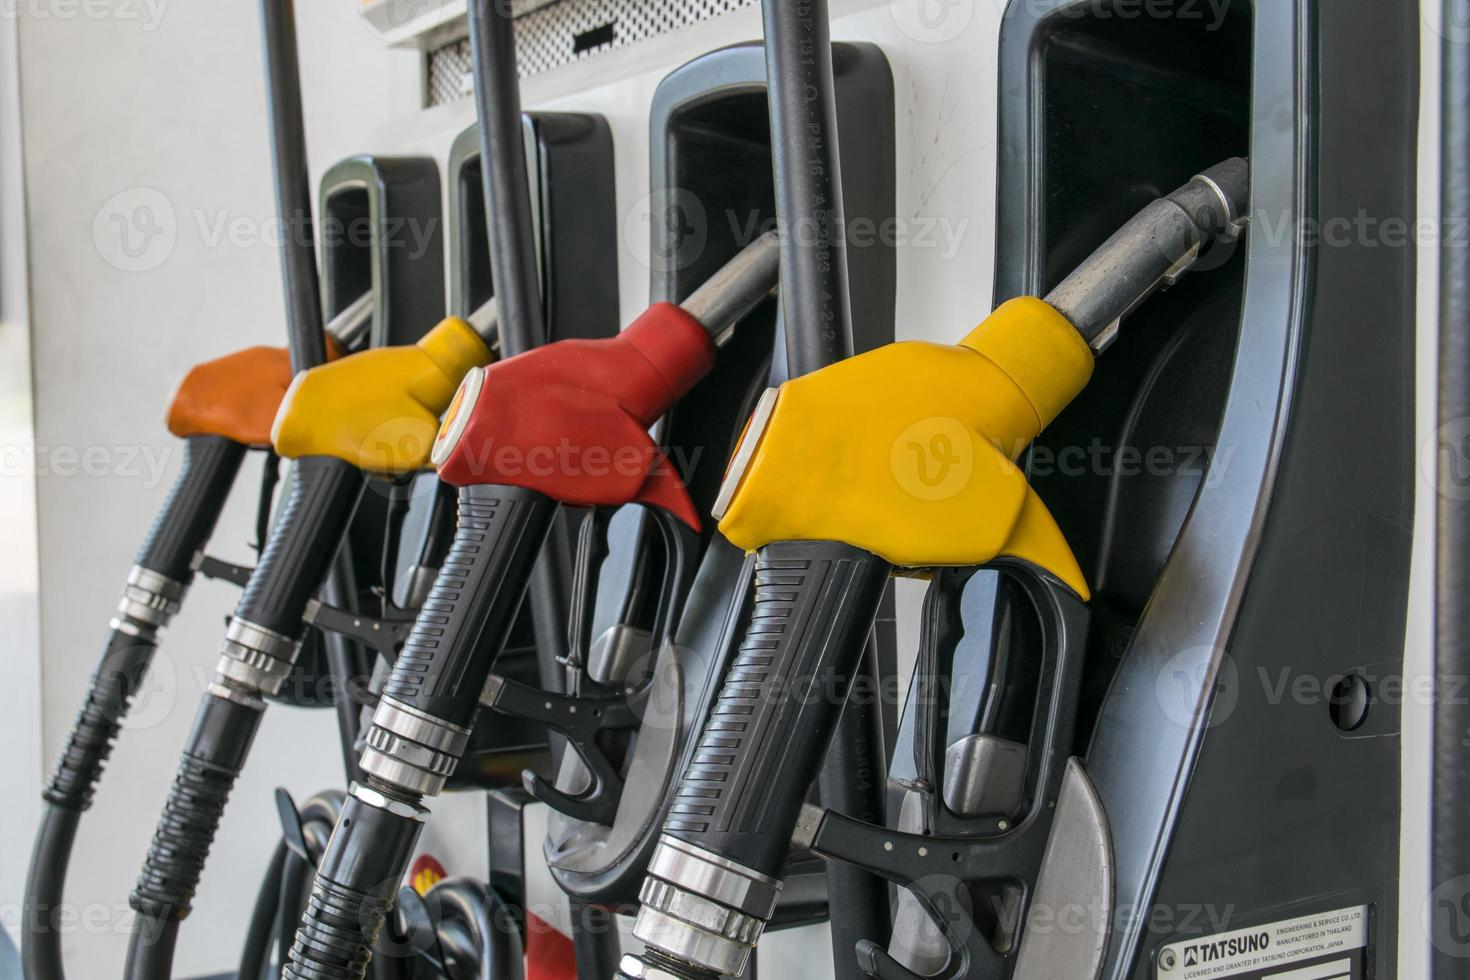 pompnozzles bij het benzinestation foto